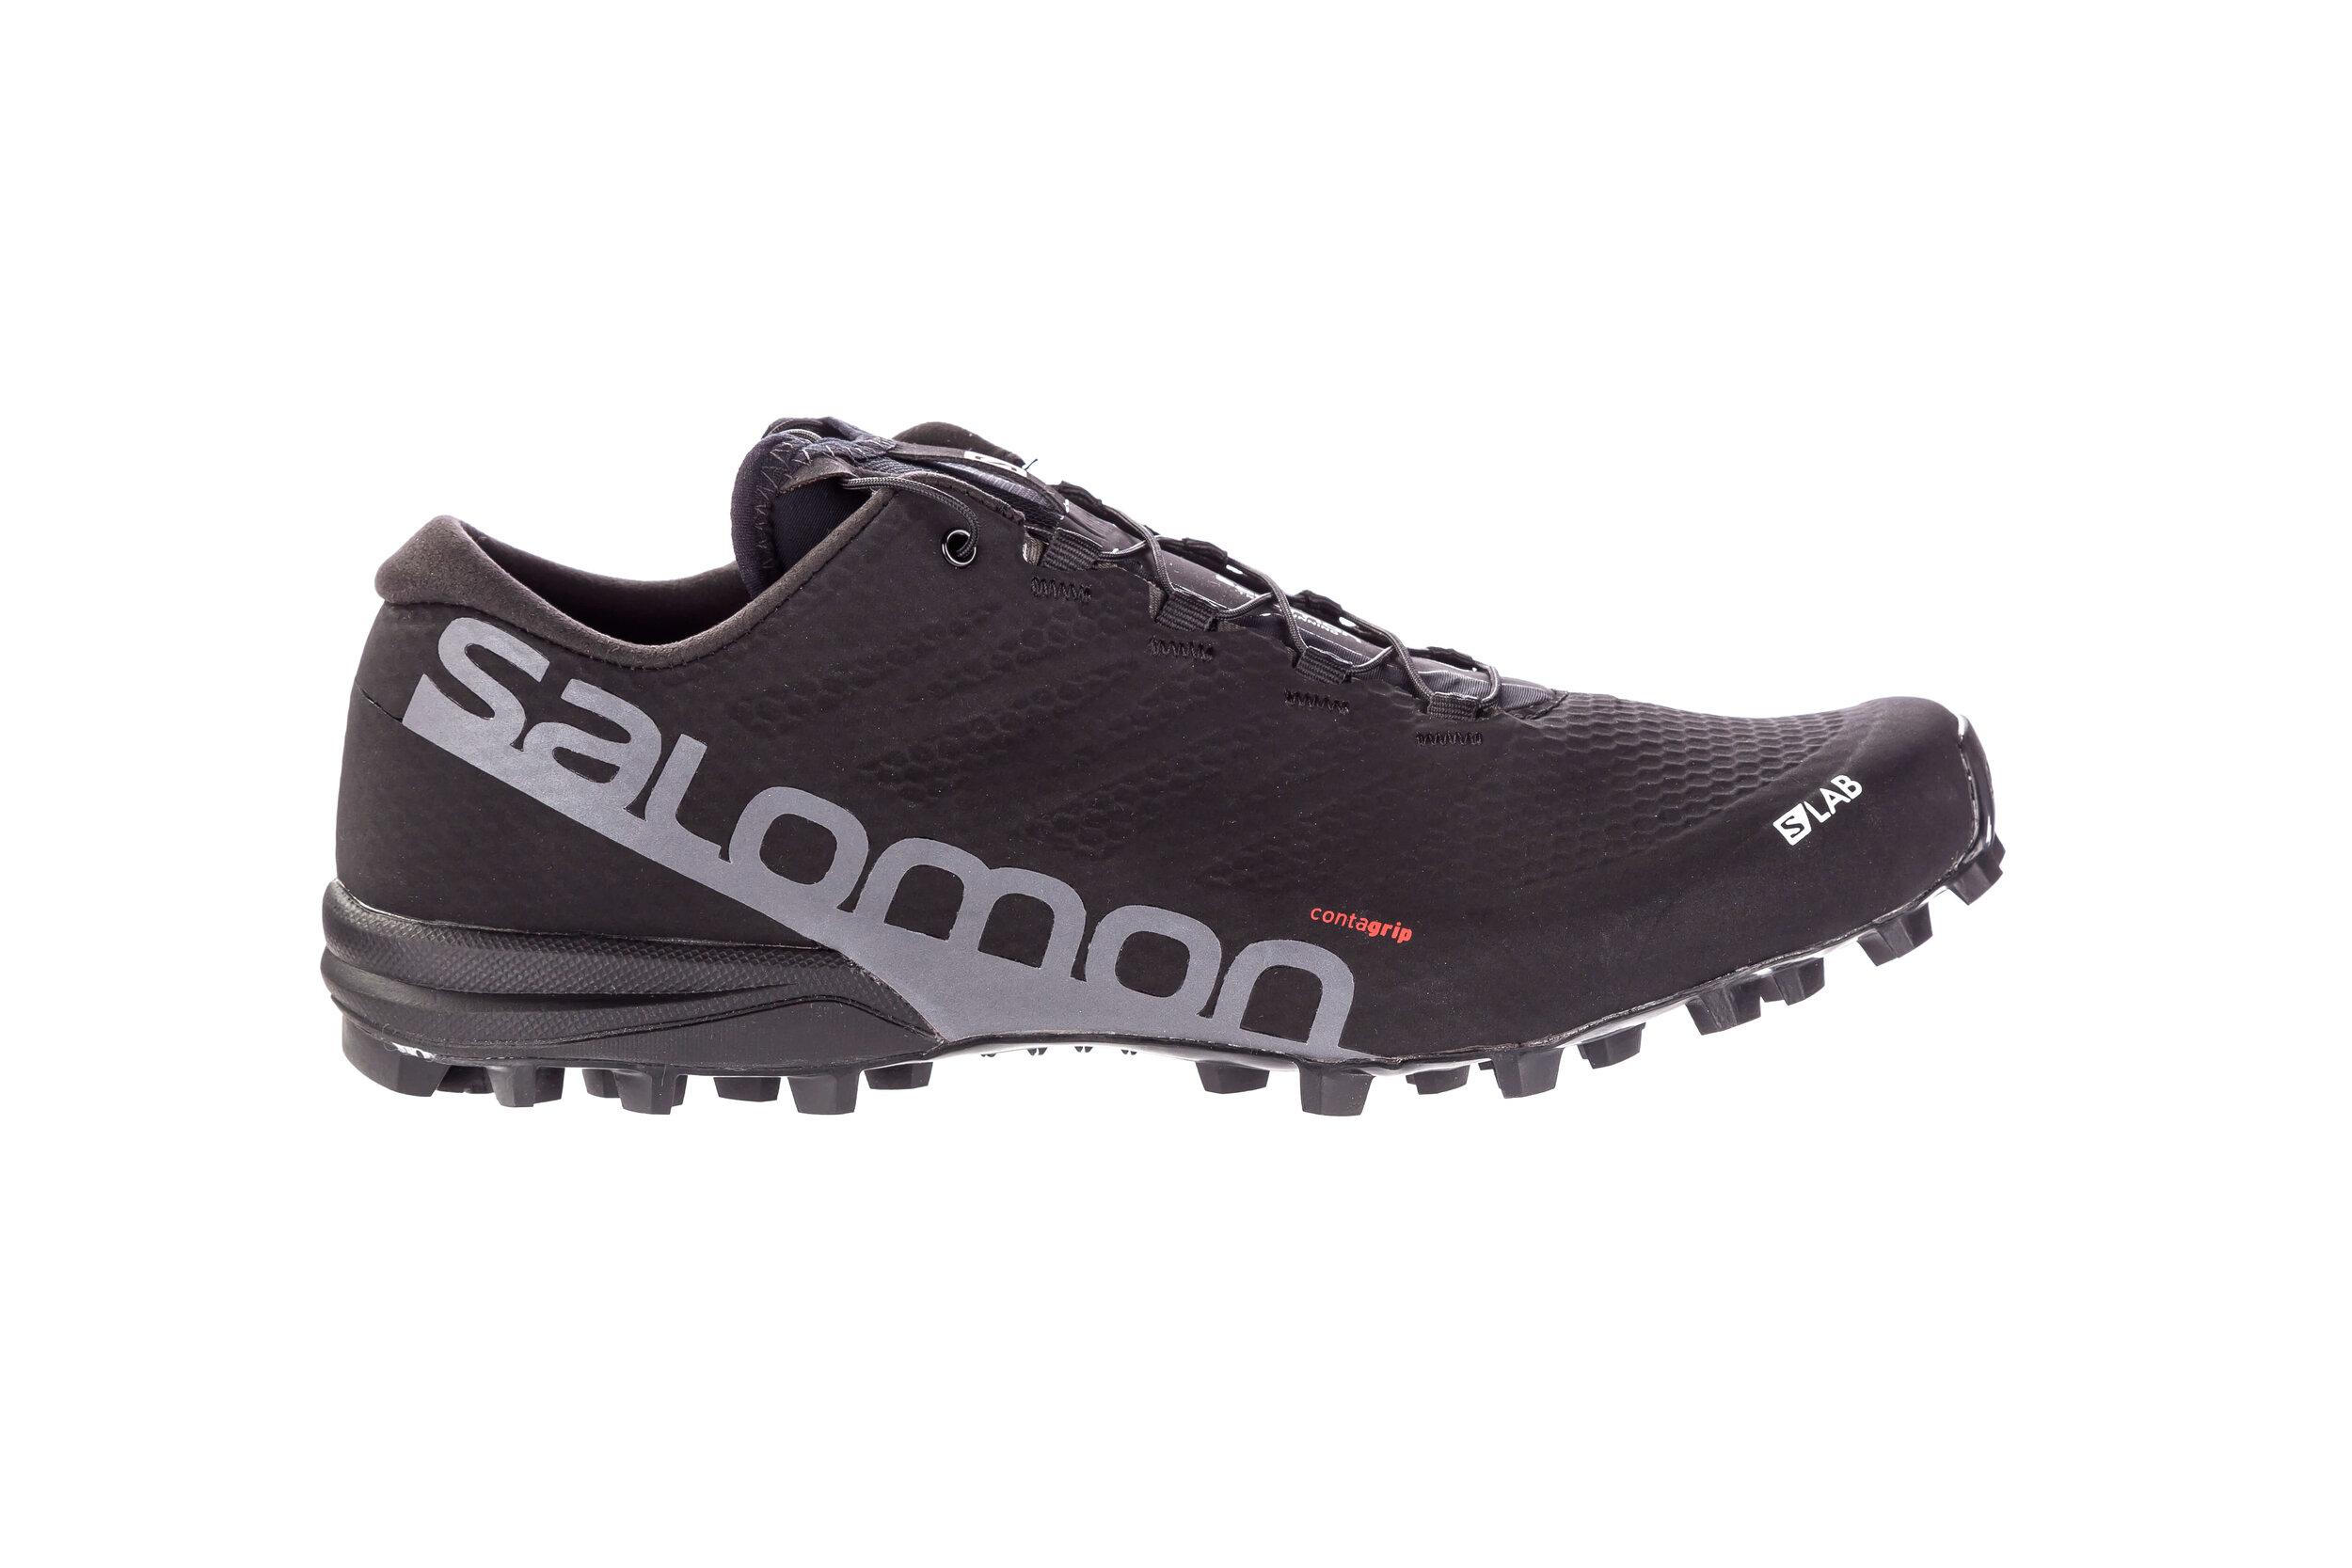 Salomon S/lab speed 2 review — Trail